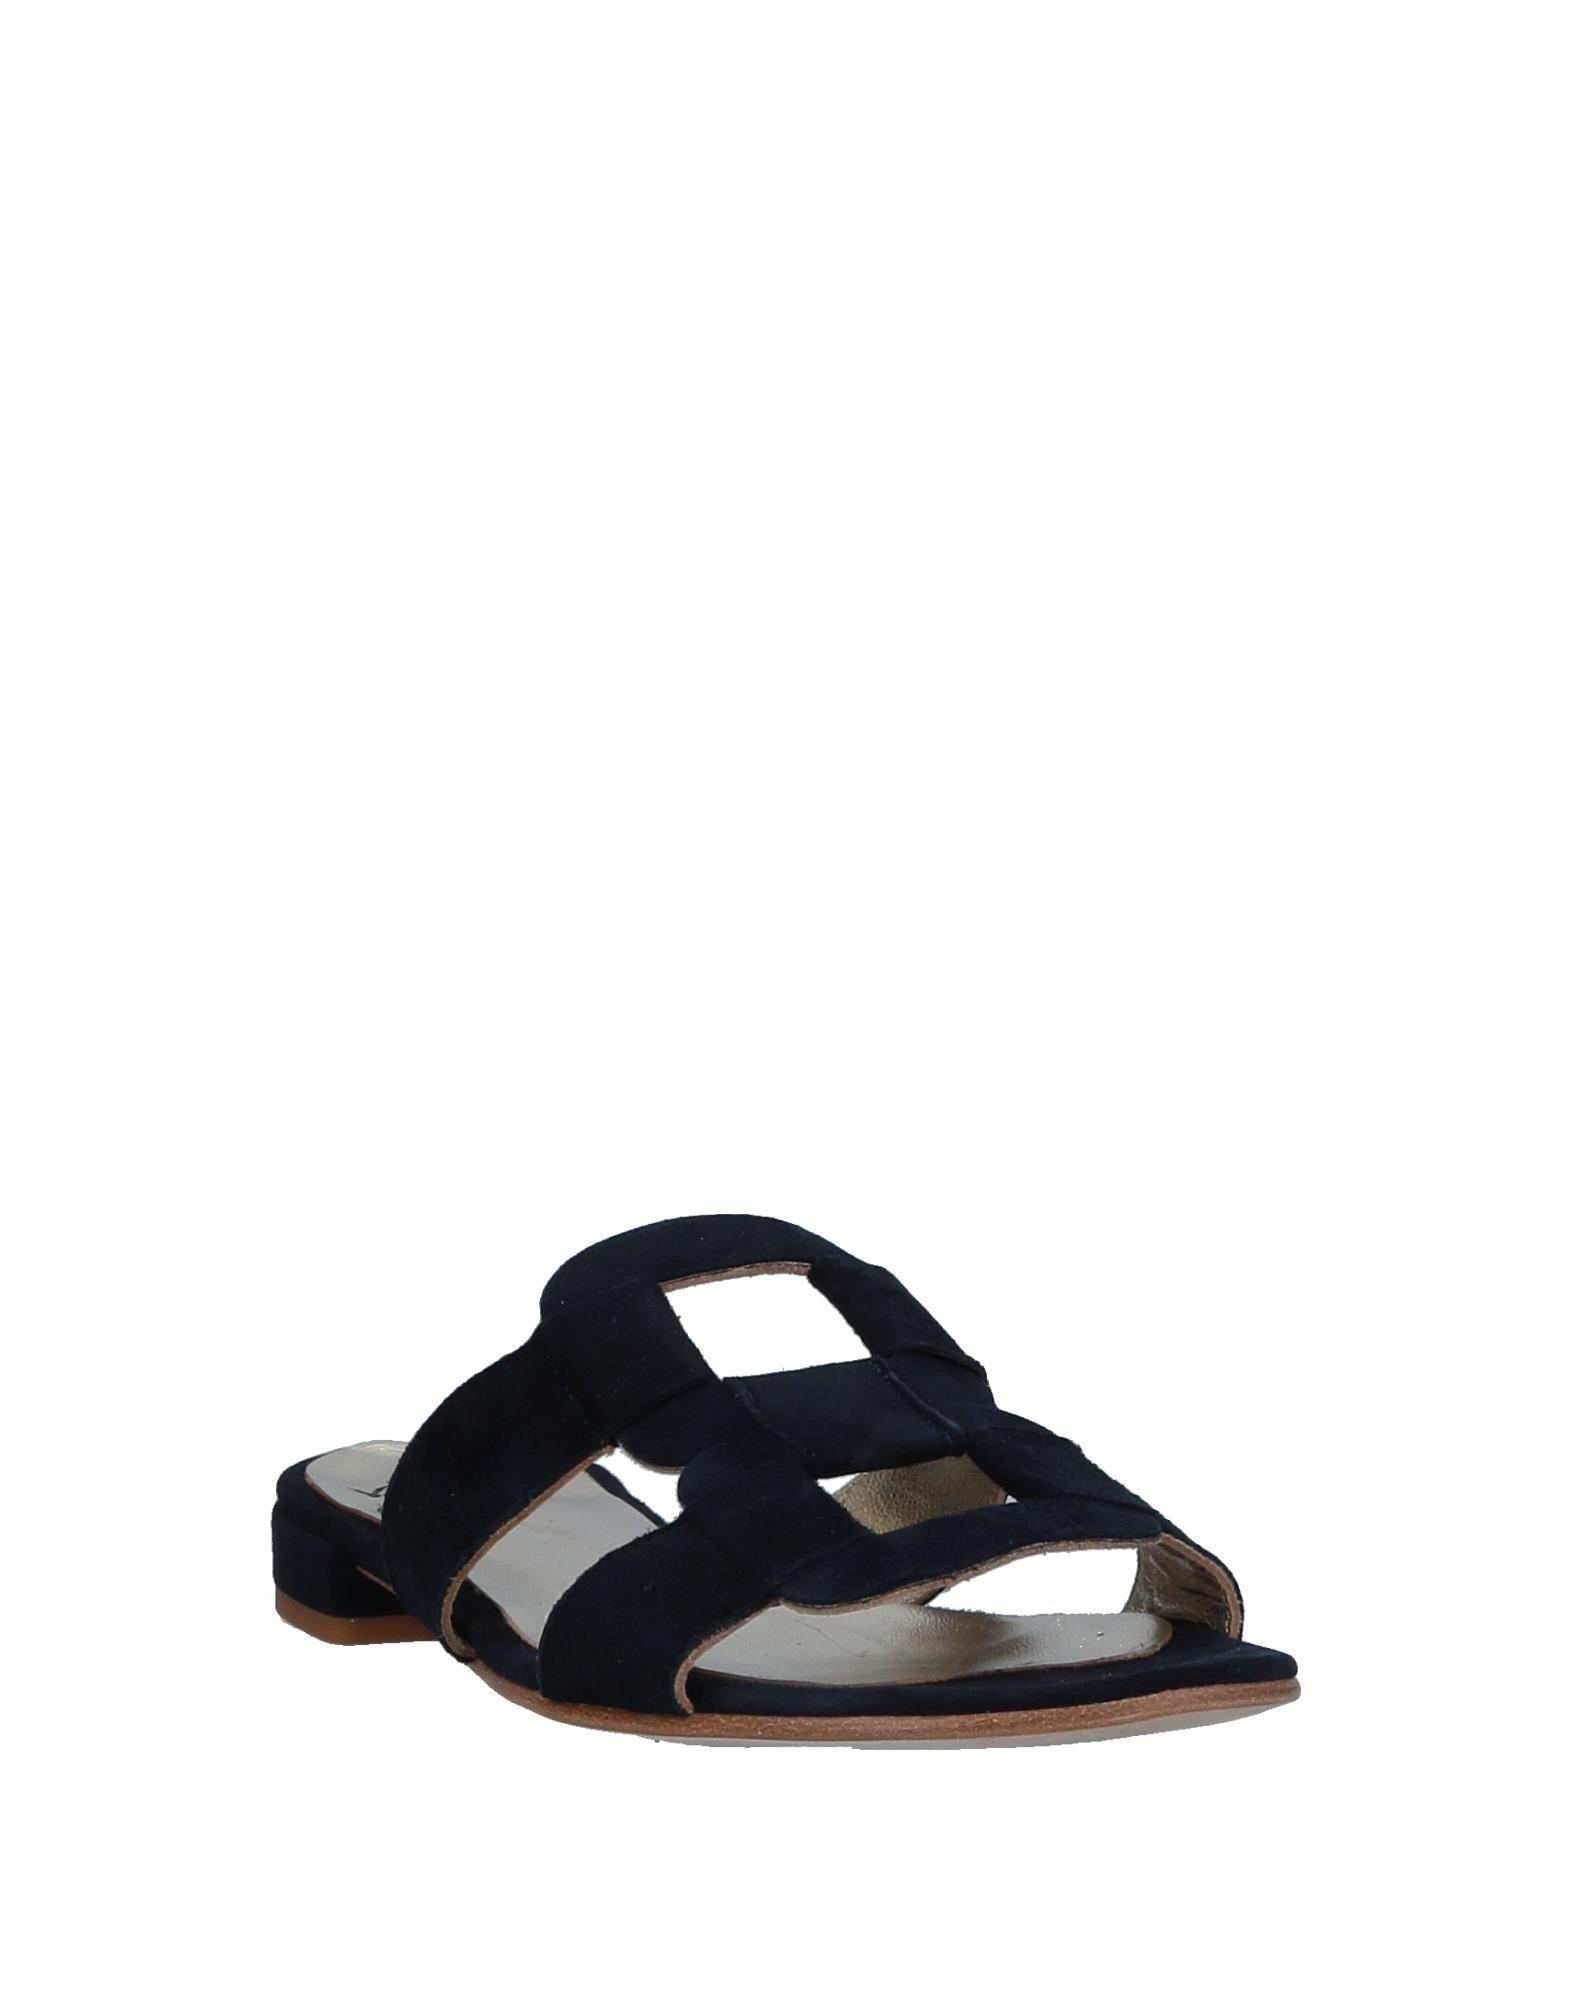 Yosh Collection Gute Pantoletten Damen  11528572MM Gute Collection Qualität beliebte Schuhe dc99a3